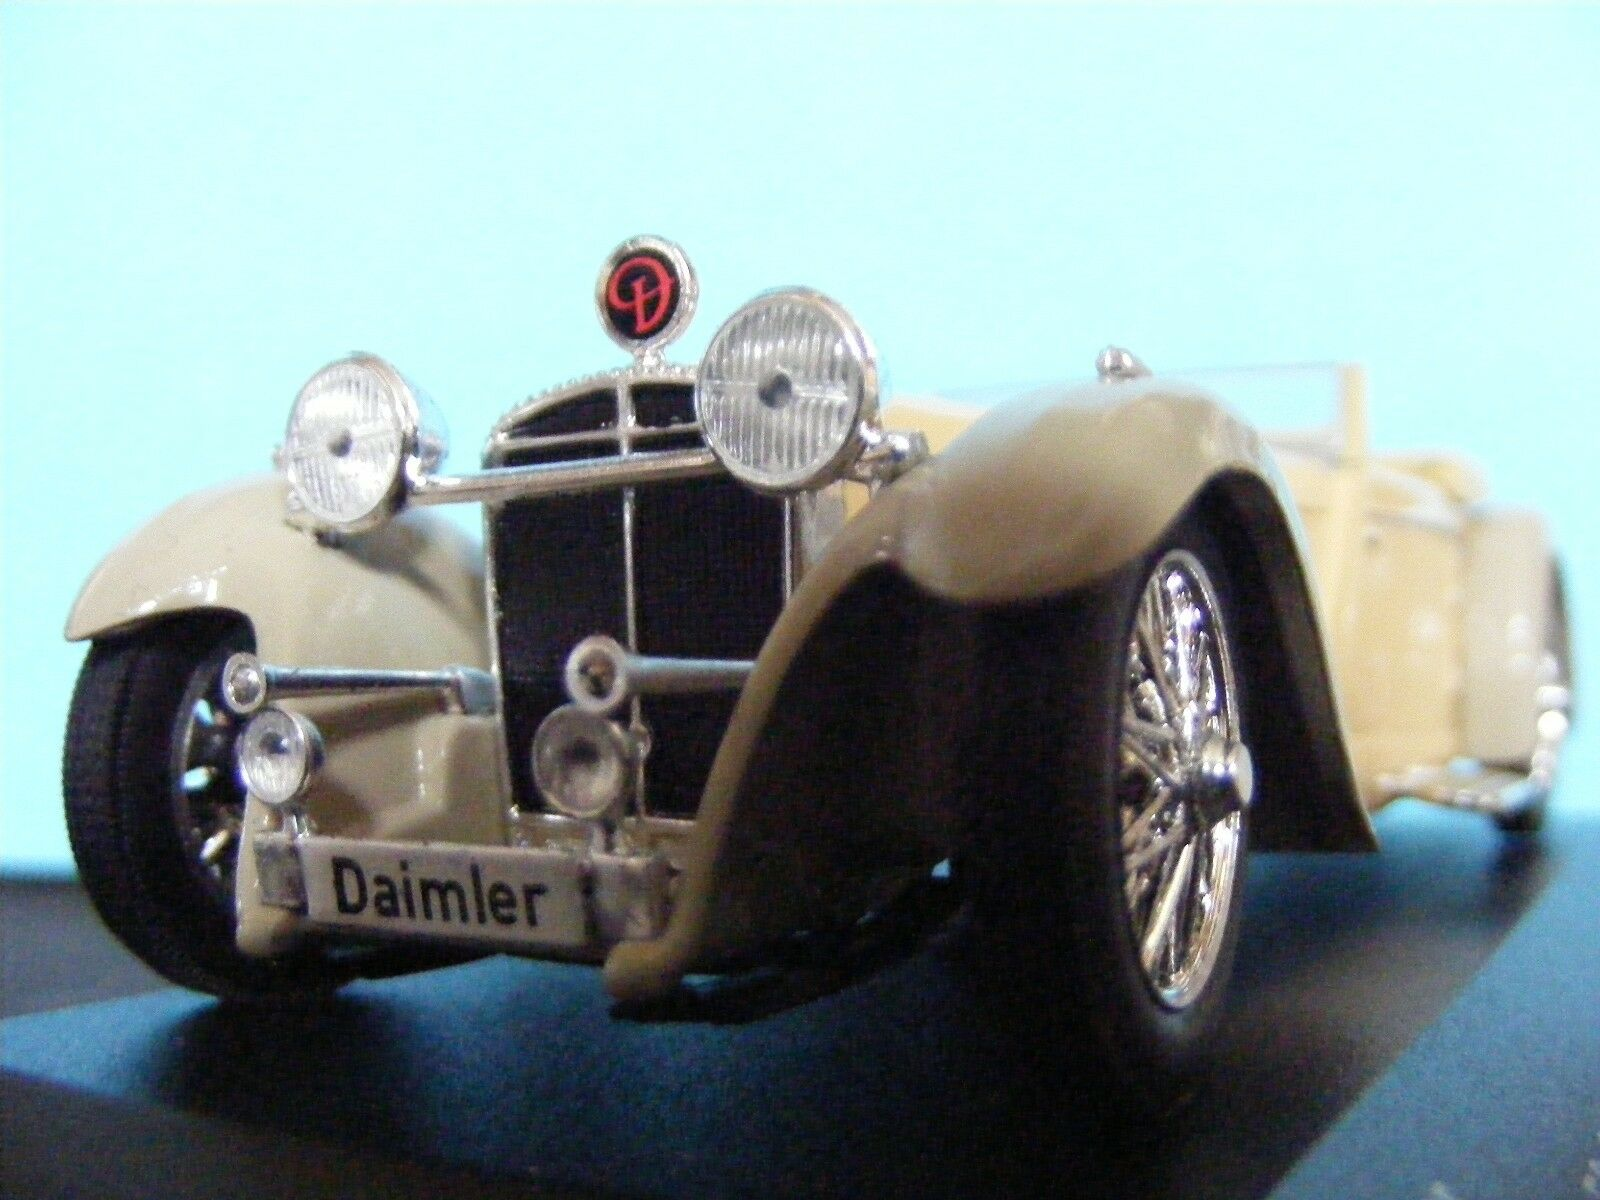 Daimler (GB) doble doble doble Six12cyl Converdeible un modelo de coleccionistas 1 43RD SC. blancobox 02974b